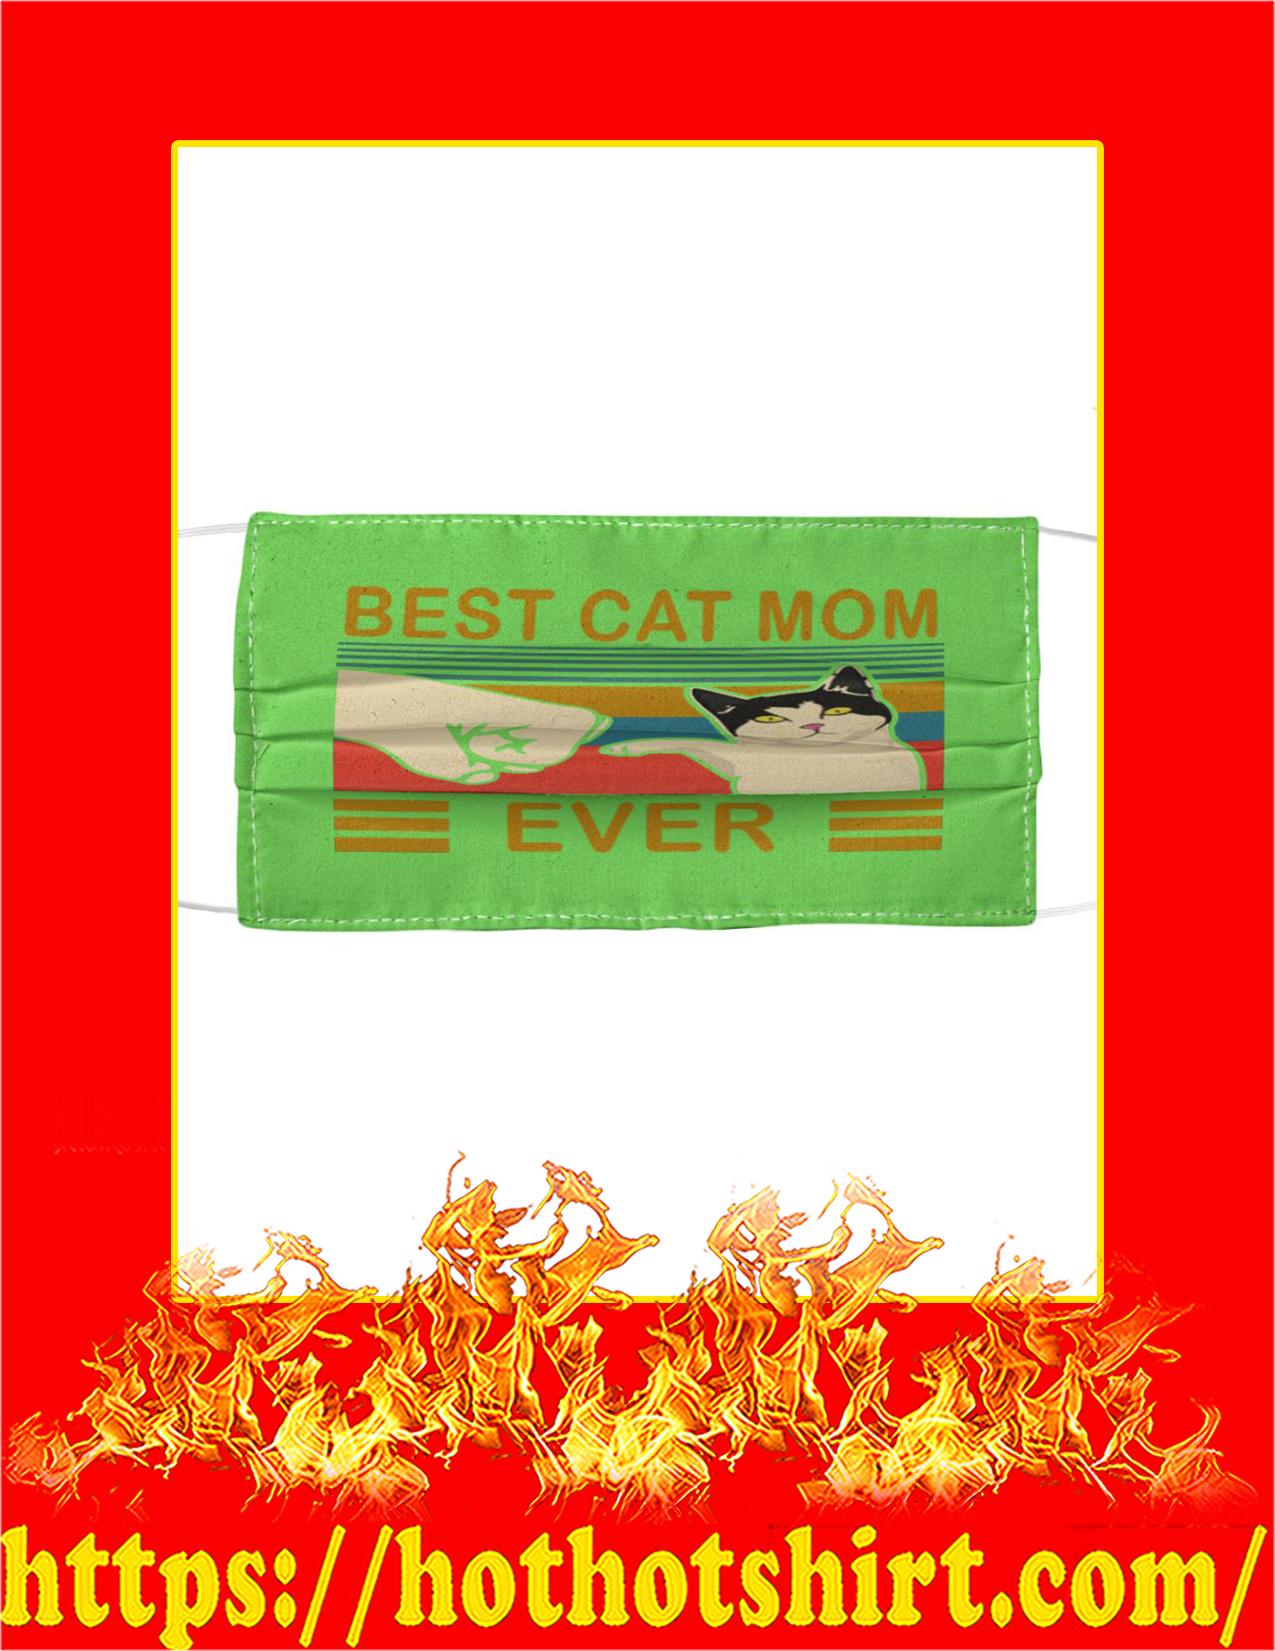 Best cat mom ever face mask - kiwi